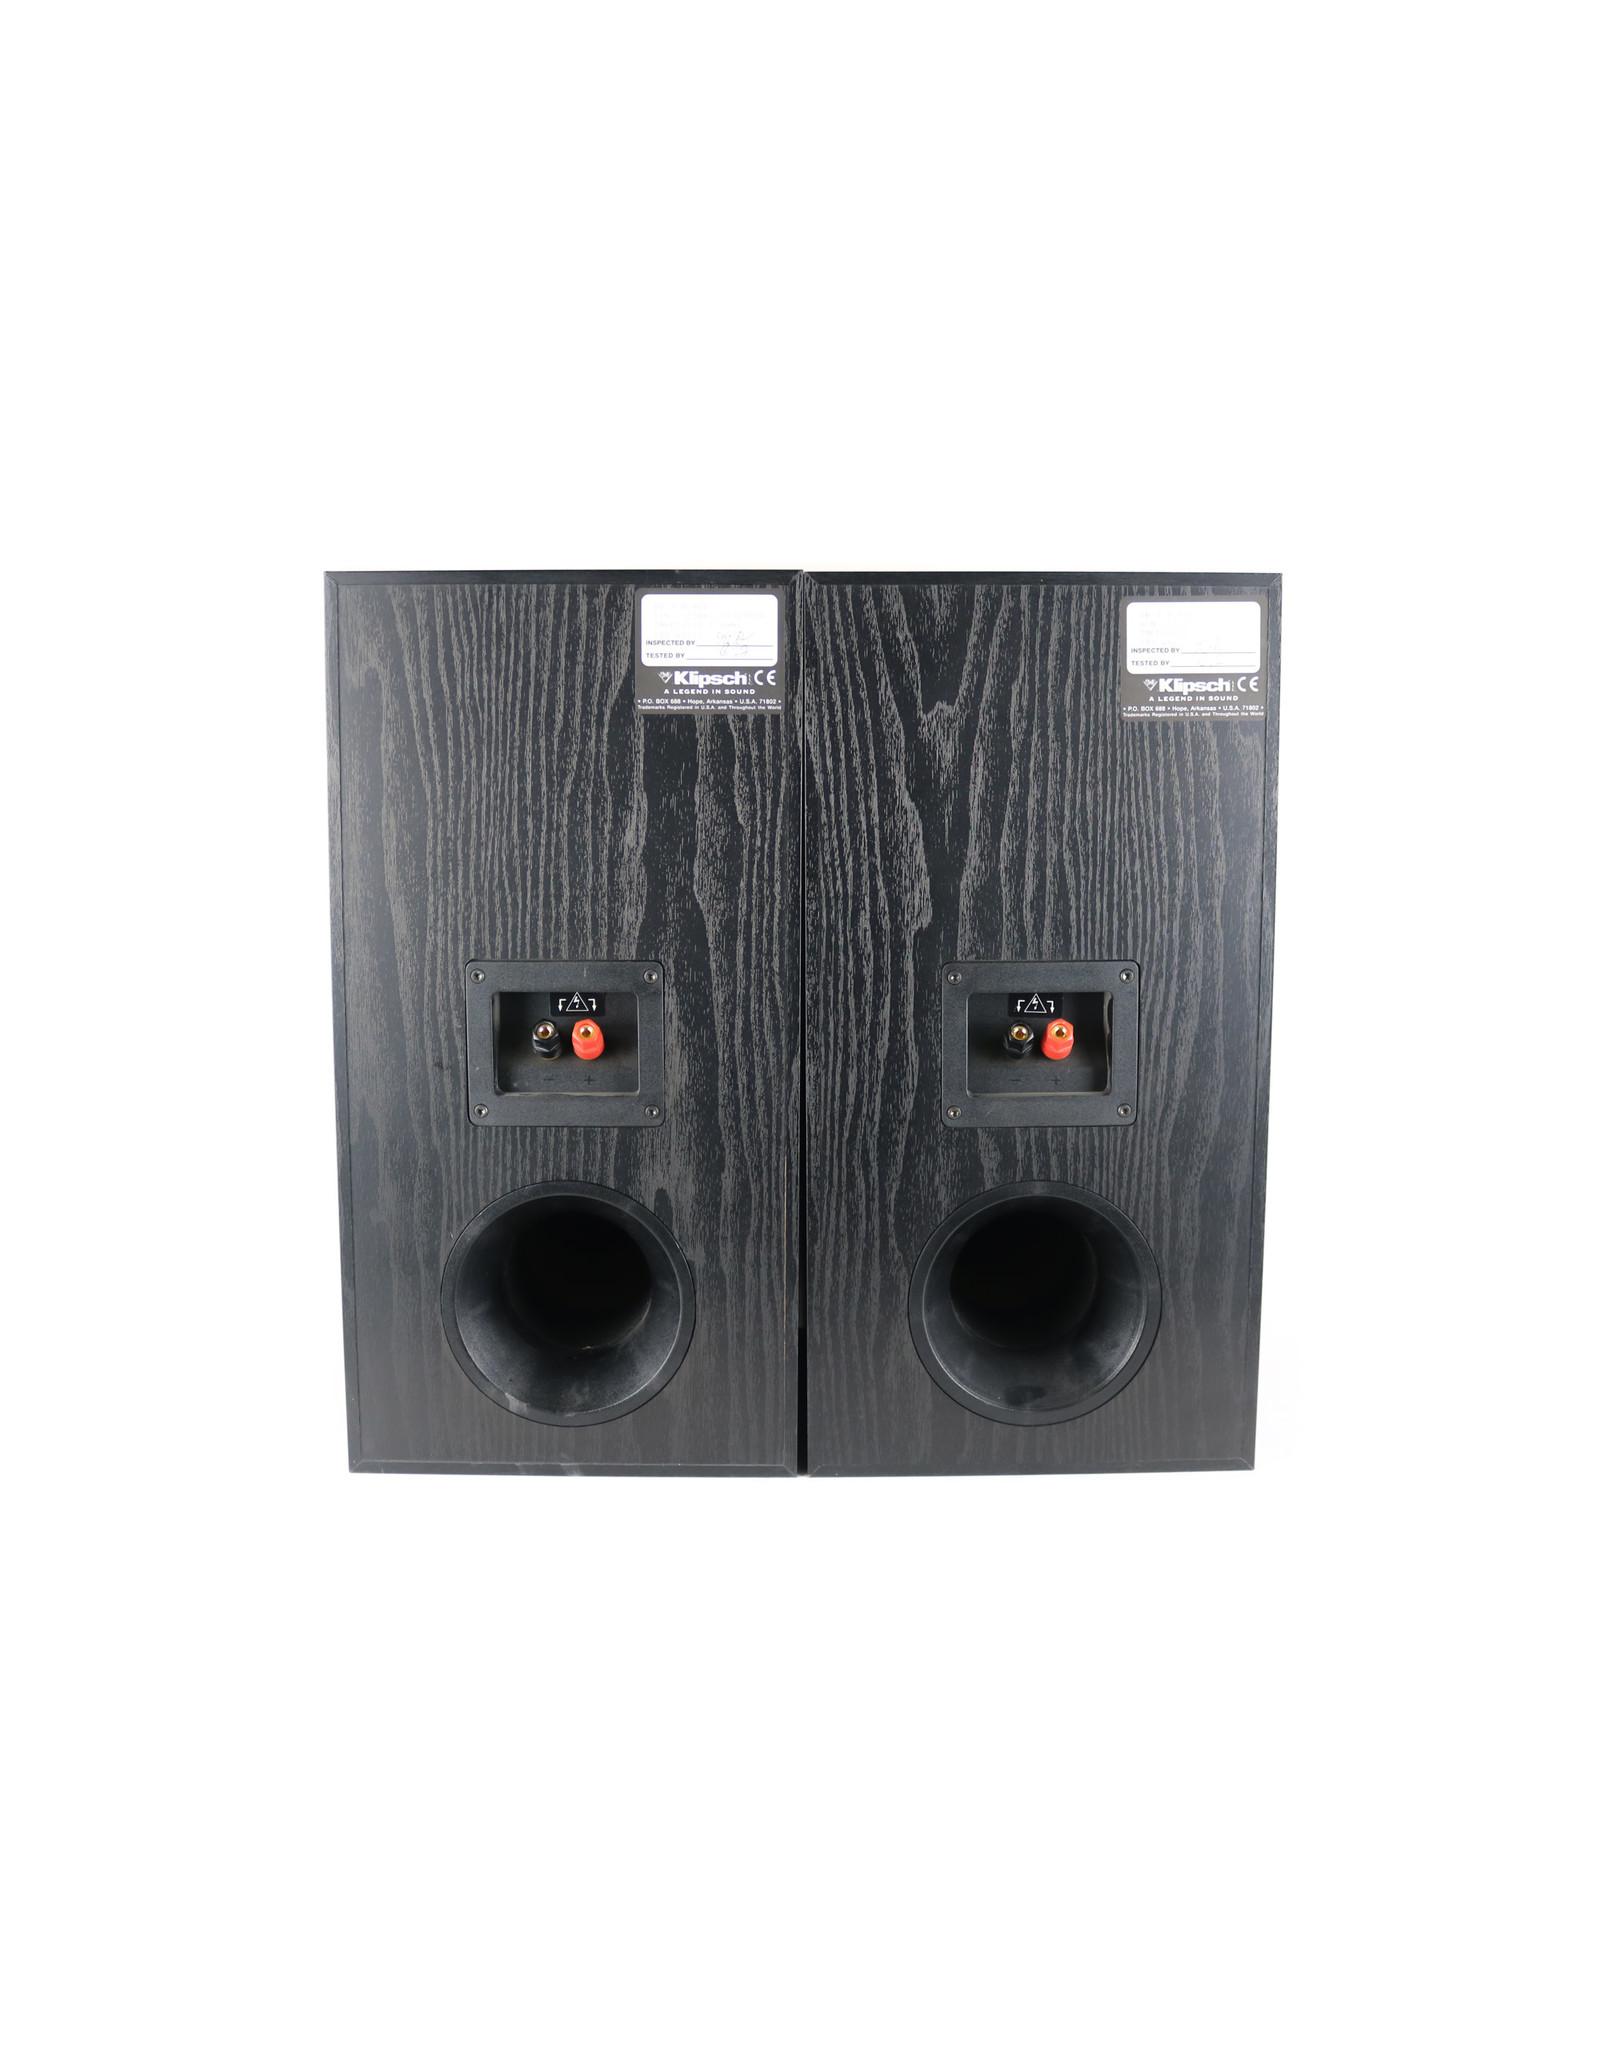 Klipsch Klipsch SB-3 Bookshelf Speakers Black USED